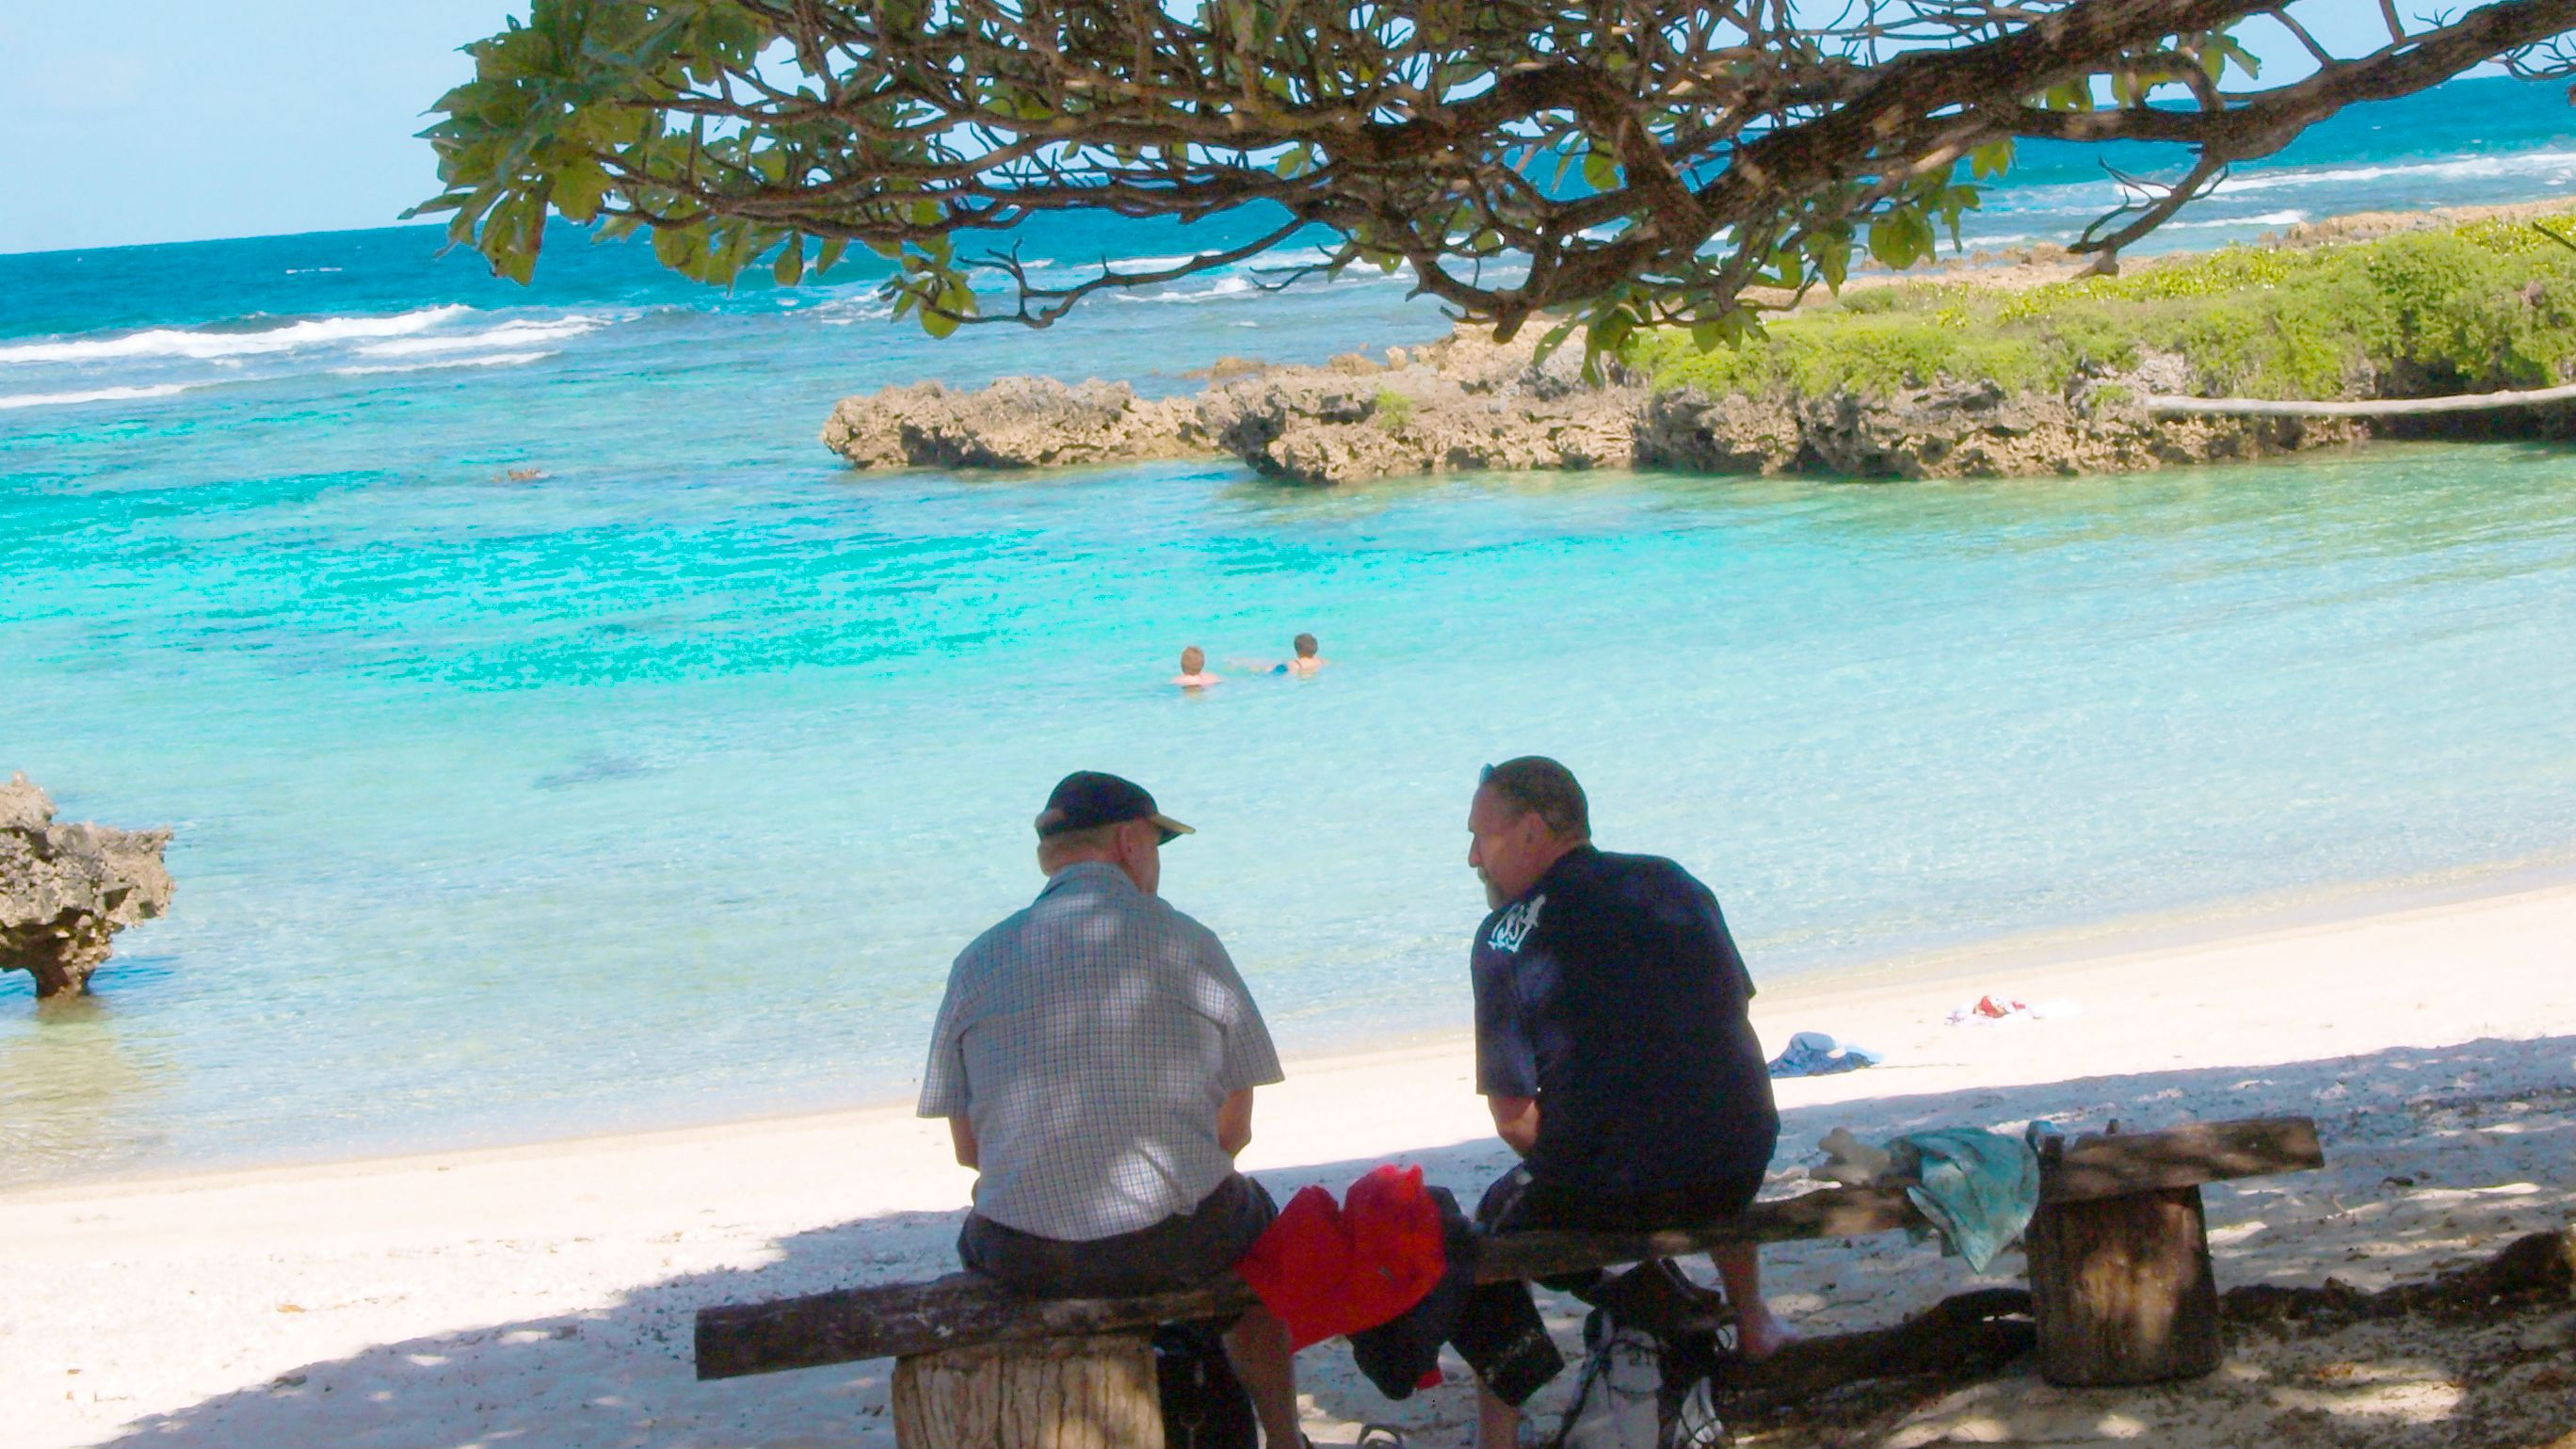 Two men sitting on a beach on Vanuatu Island